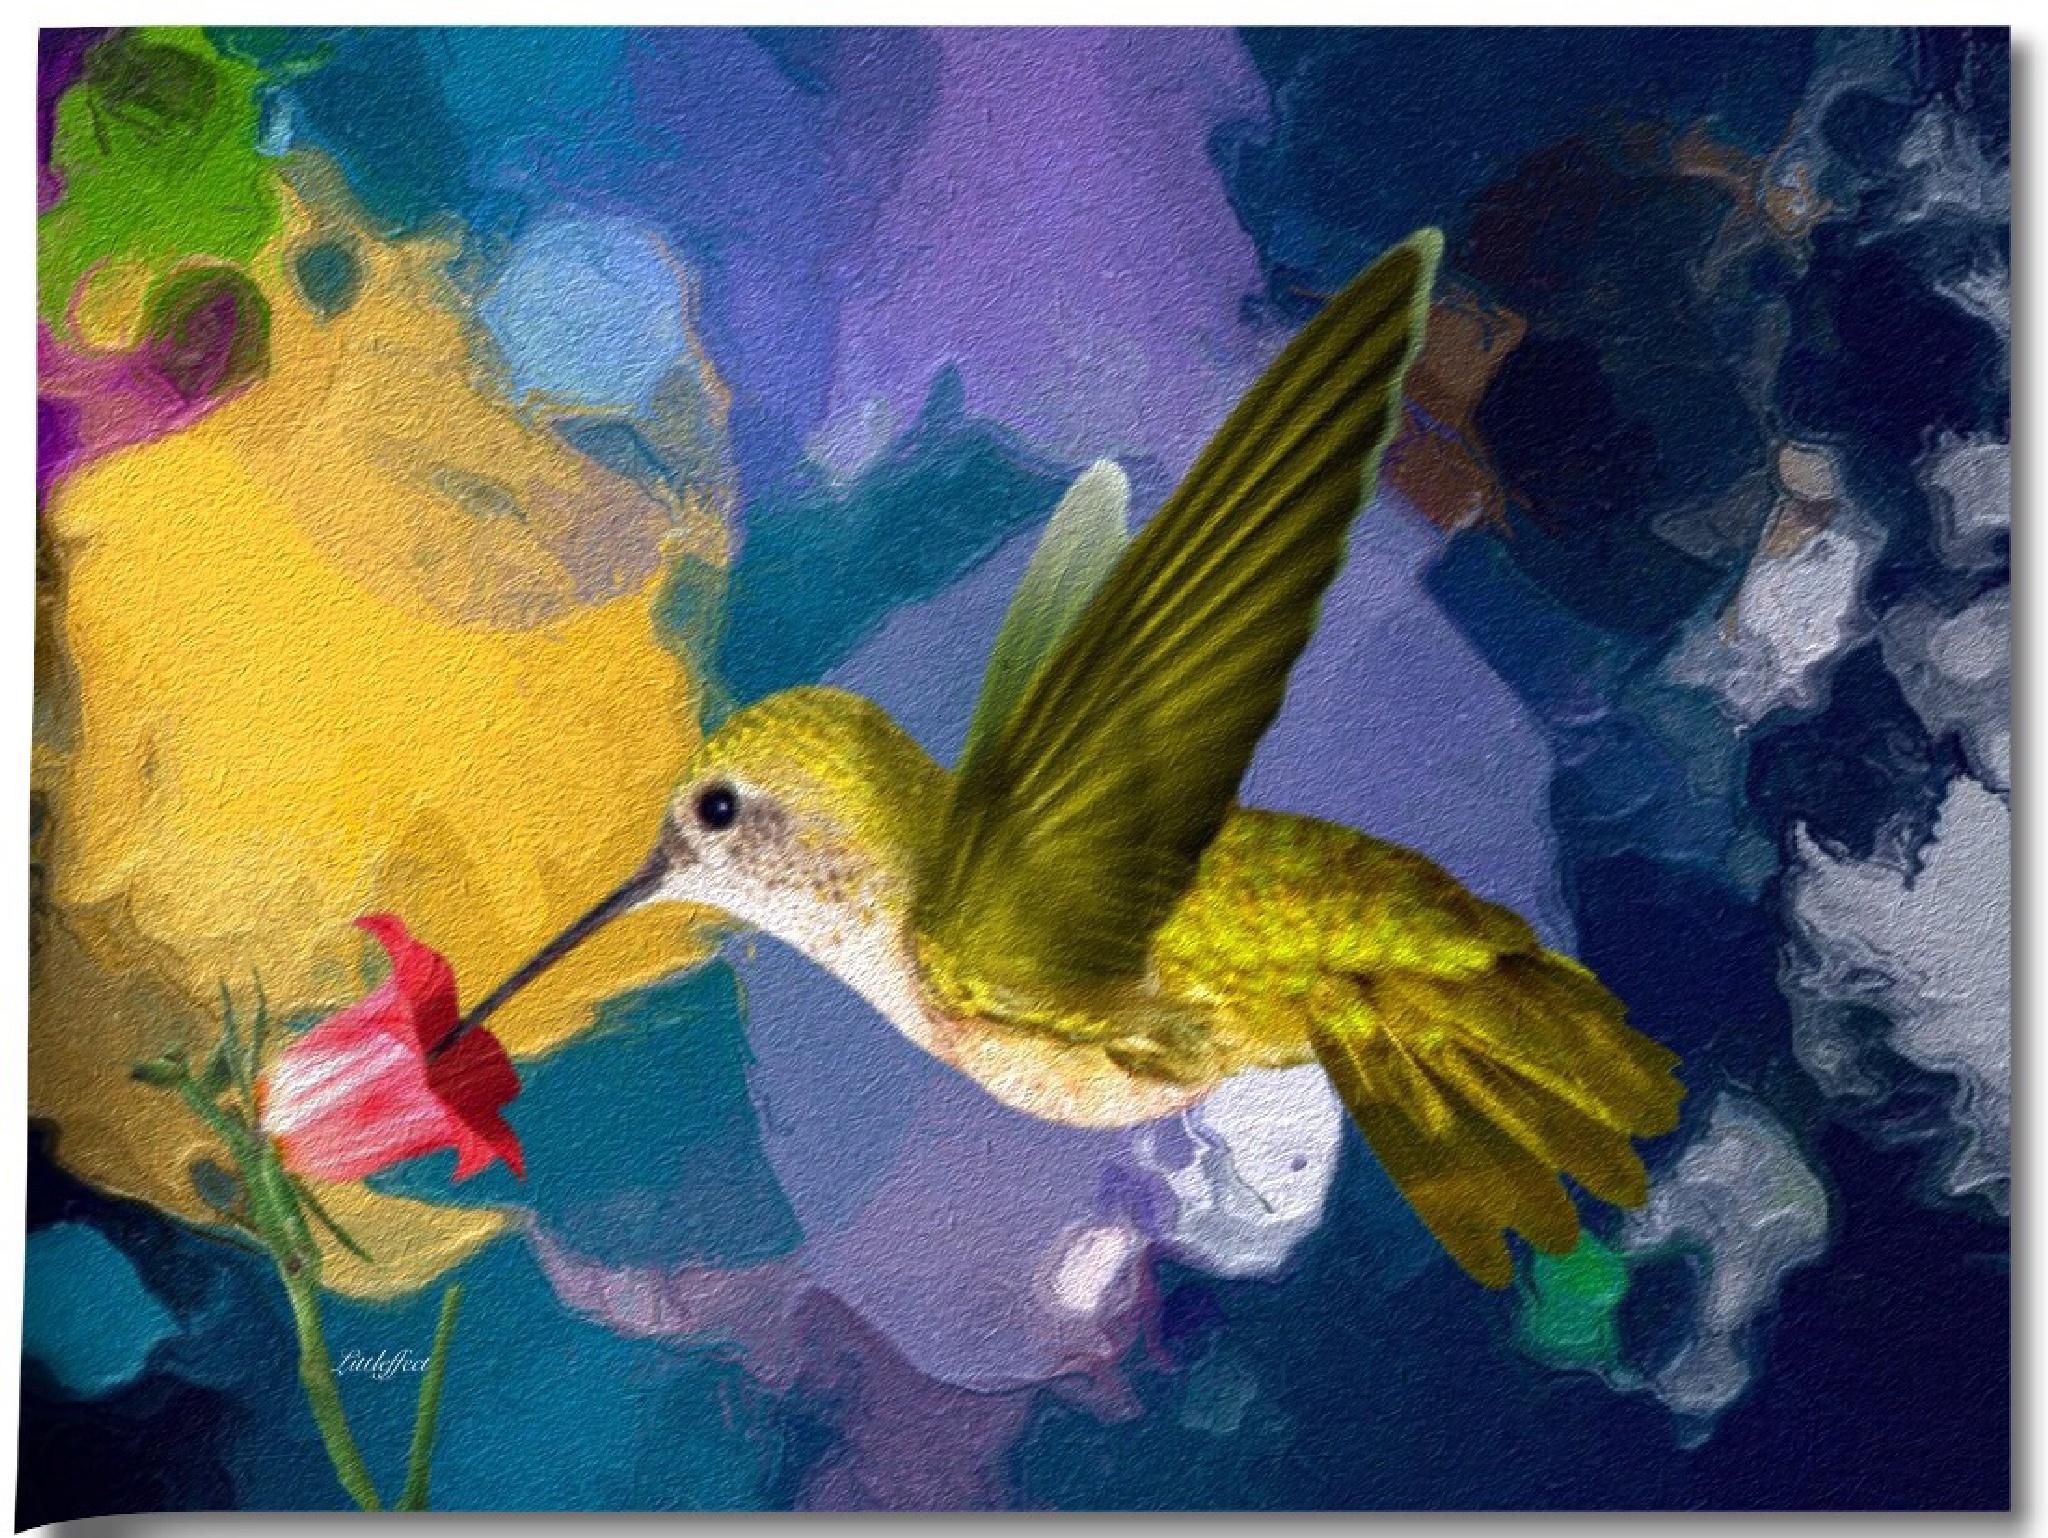 Nectar  by Littleffect